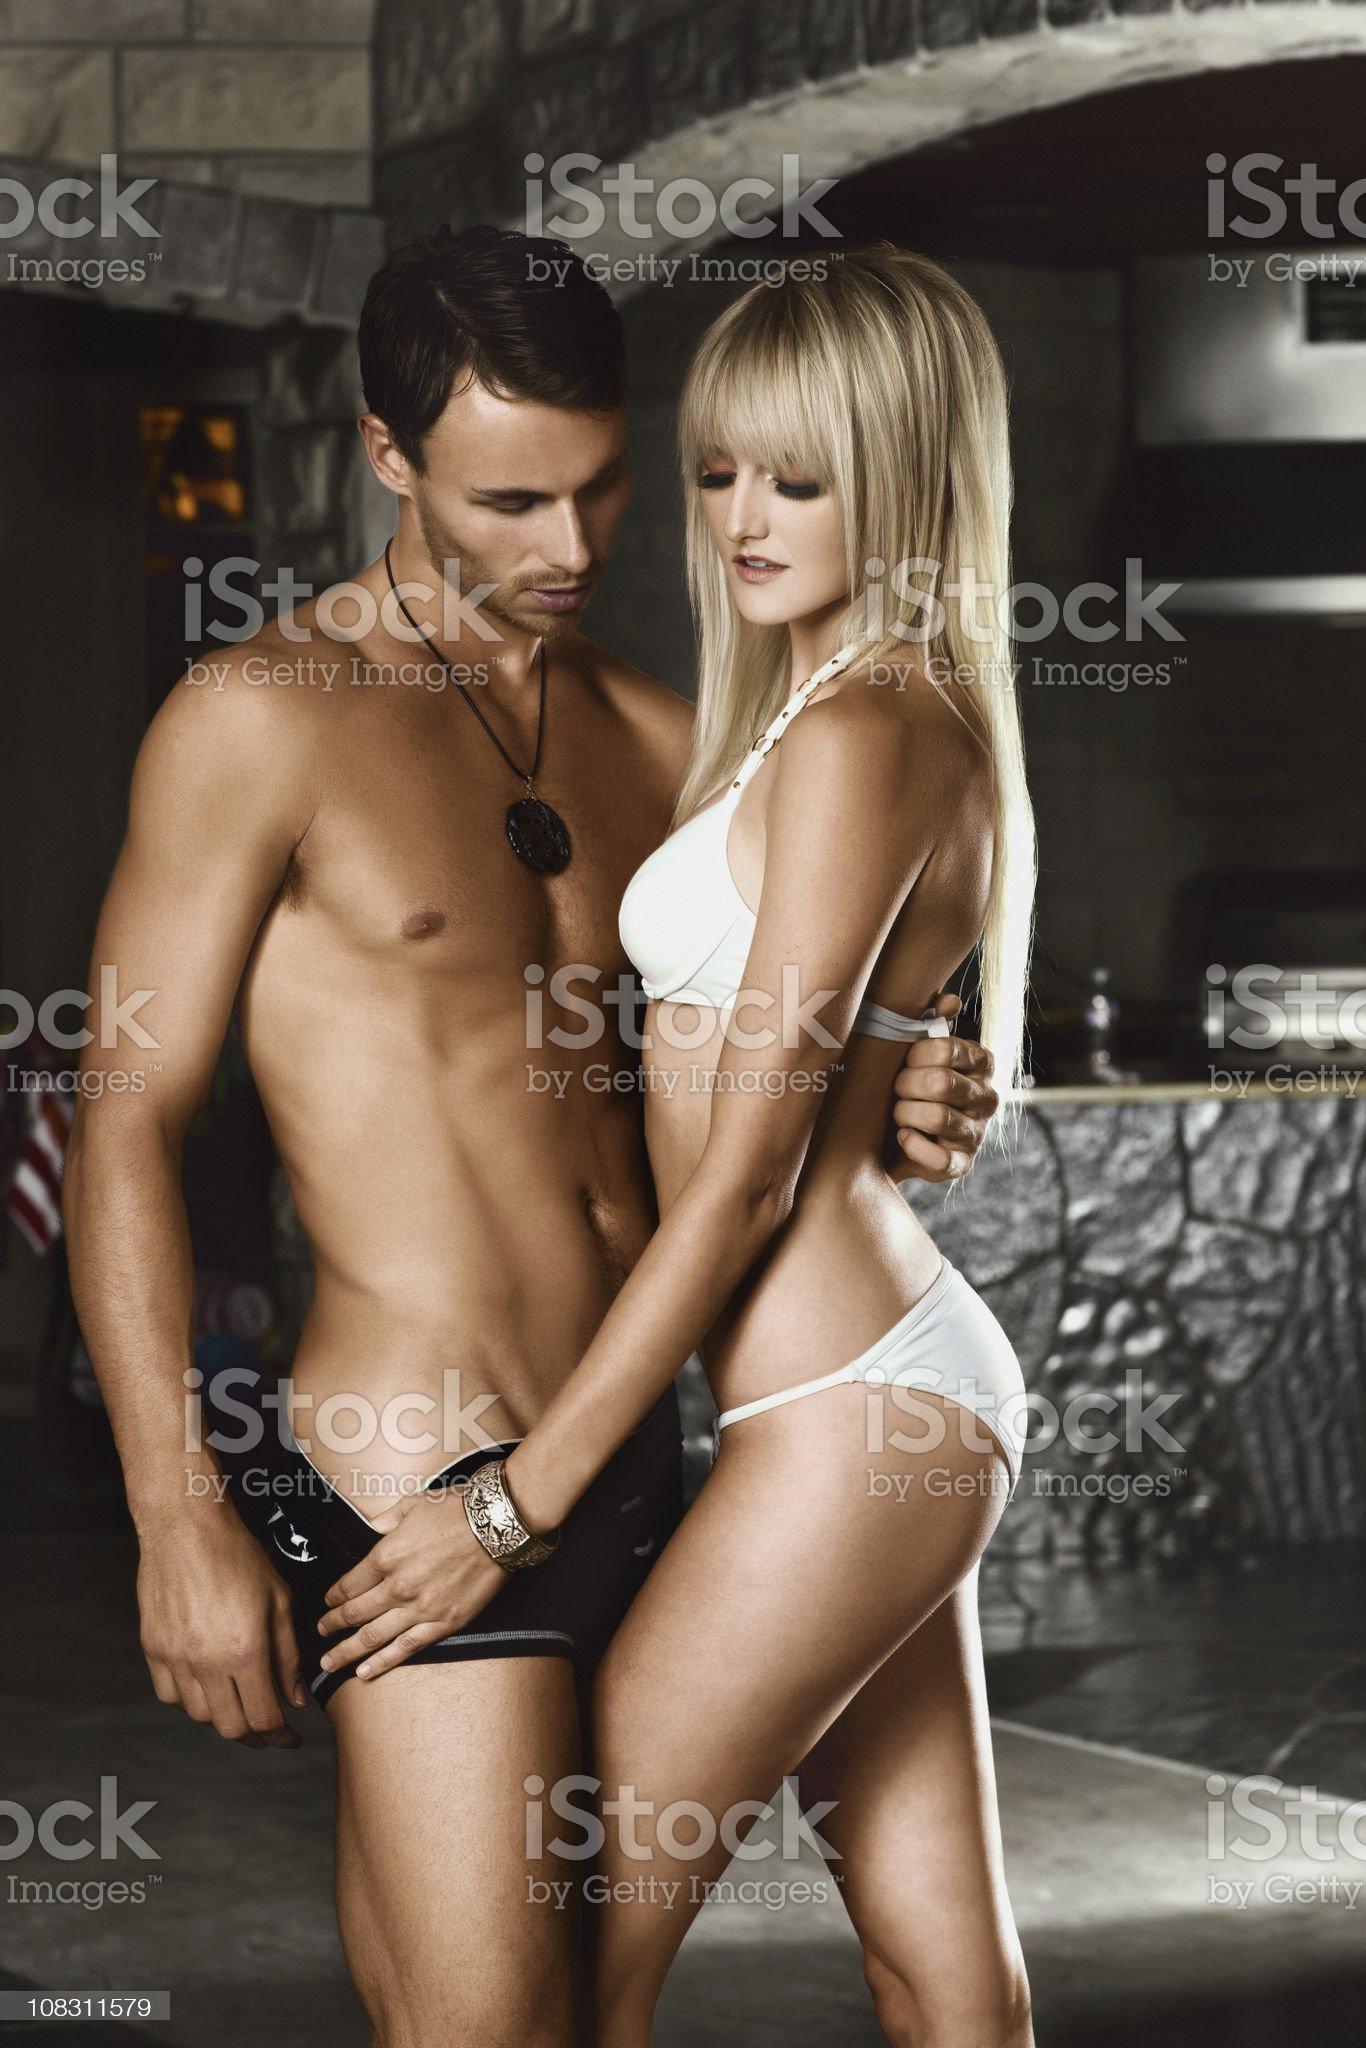 Beautiful Sexy Young Couple Modeling Swimwear royalty-free stock photo